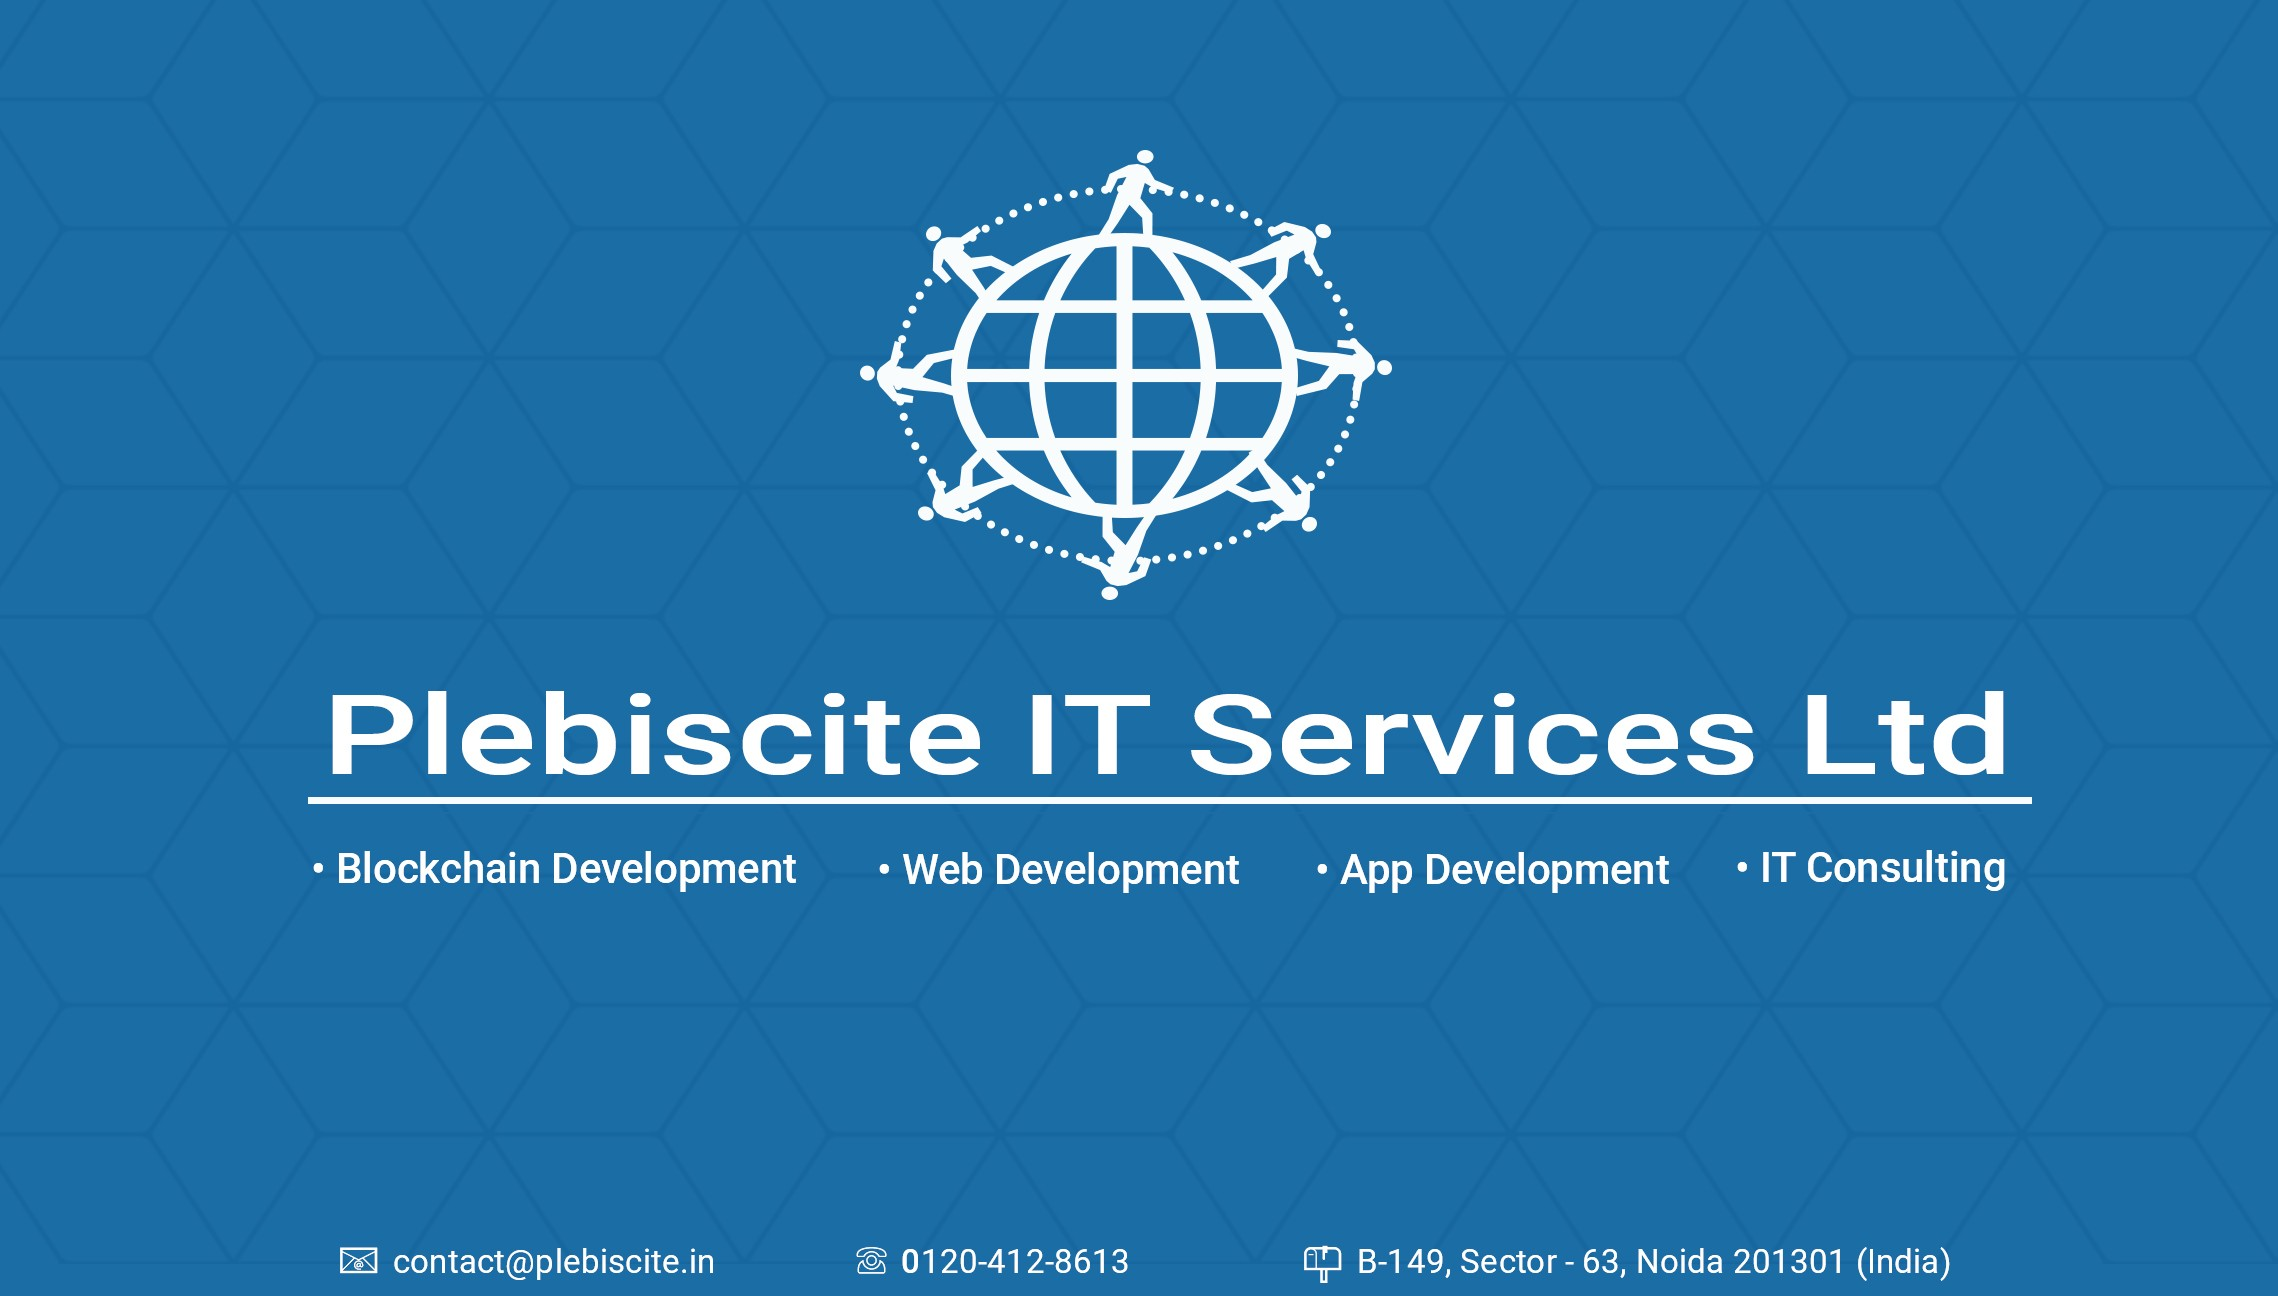 Plebiscite IT Services Pvt Ltd | LinkedIn